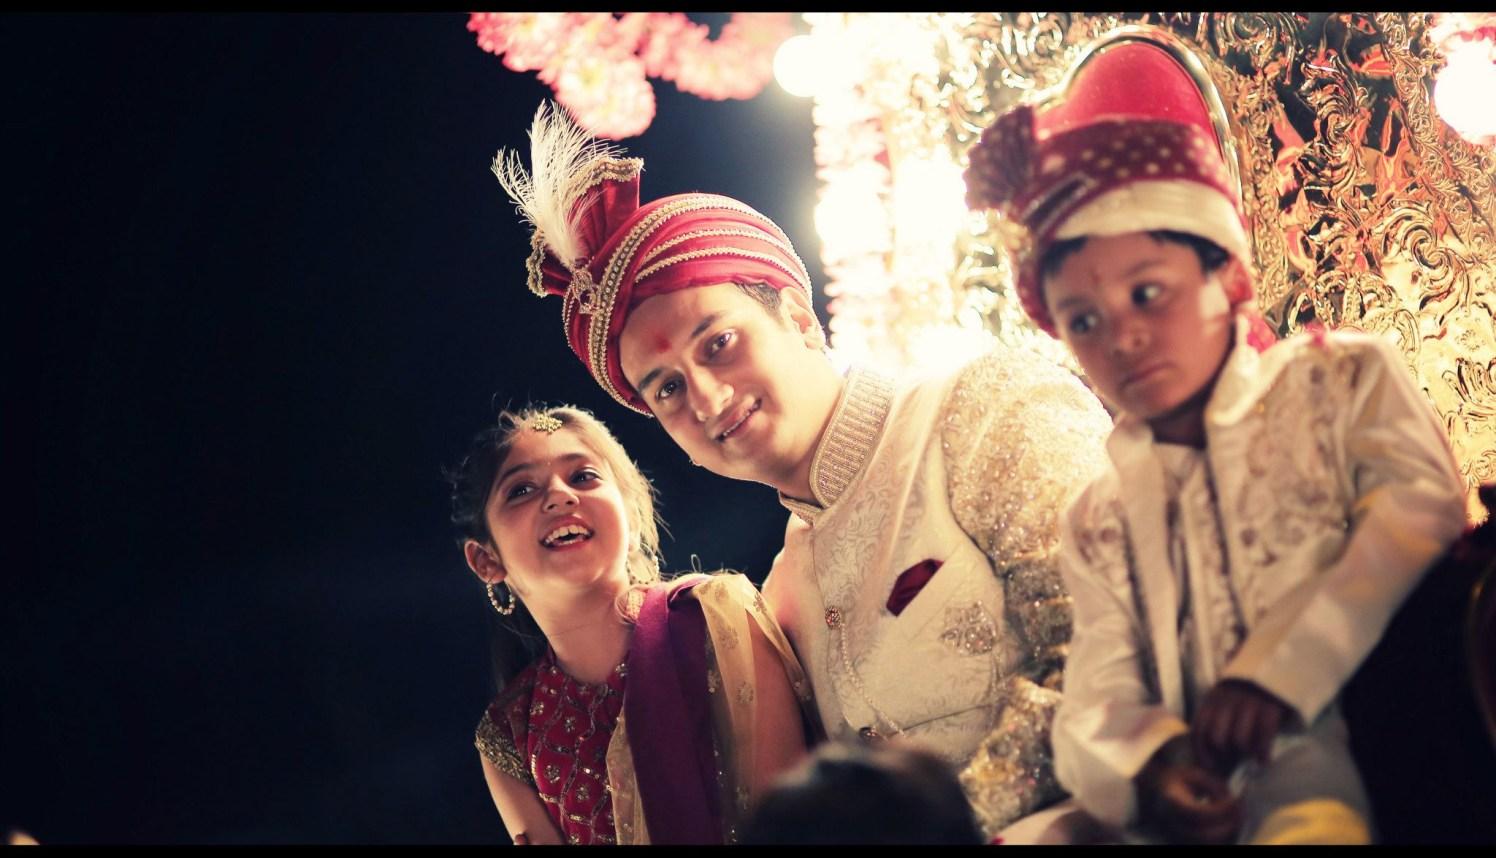 Look of adoration by Wedding Krafter Wedding-photography | Weddings Photos & Ideas